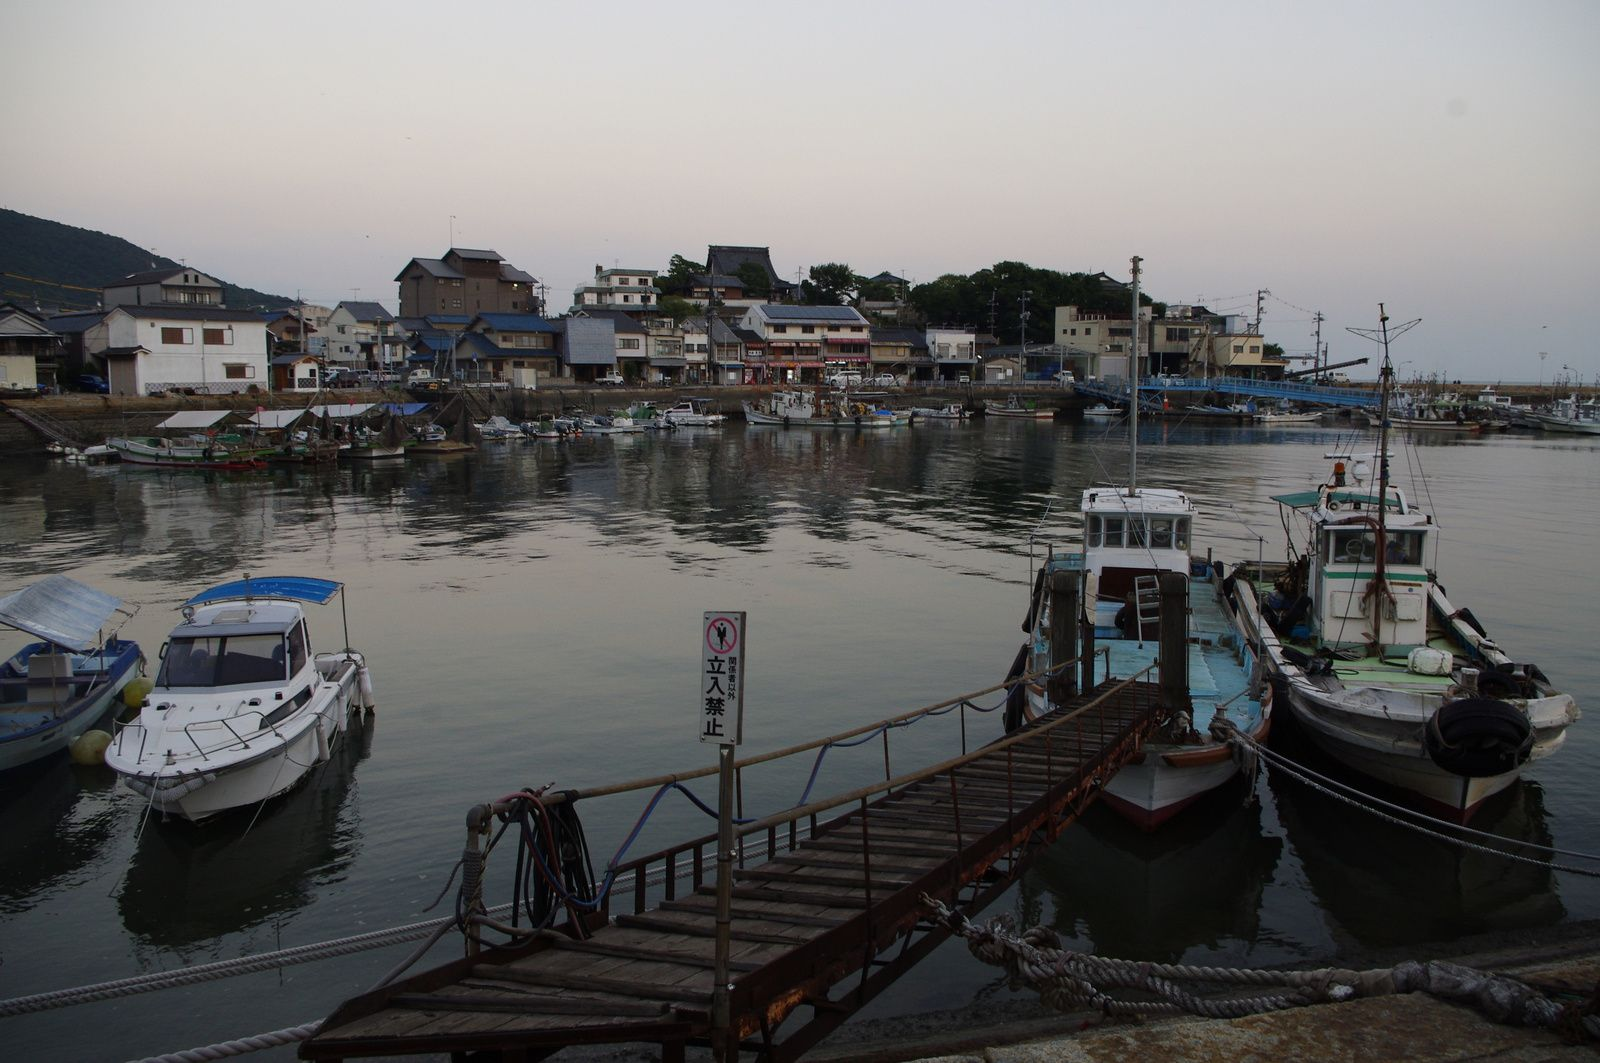 le port de Tomonoura